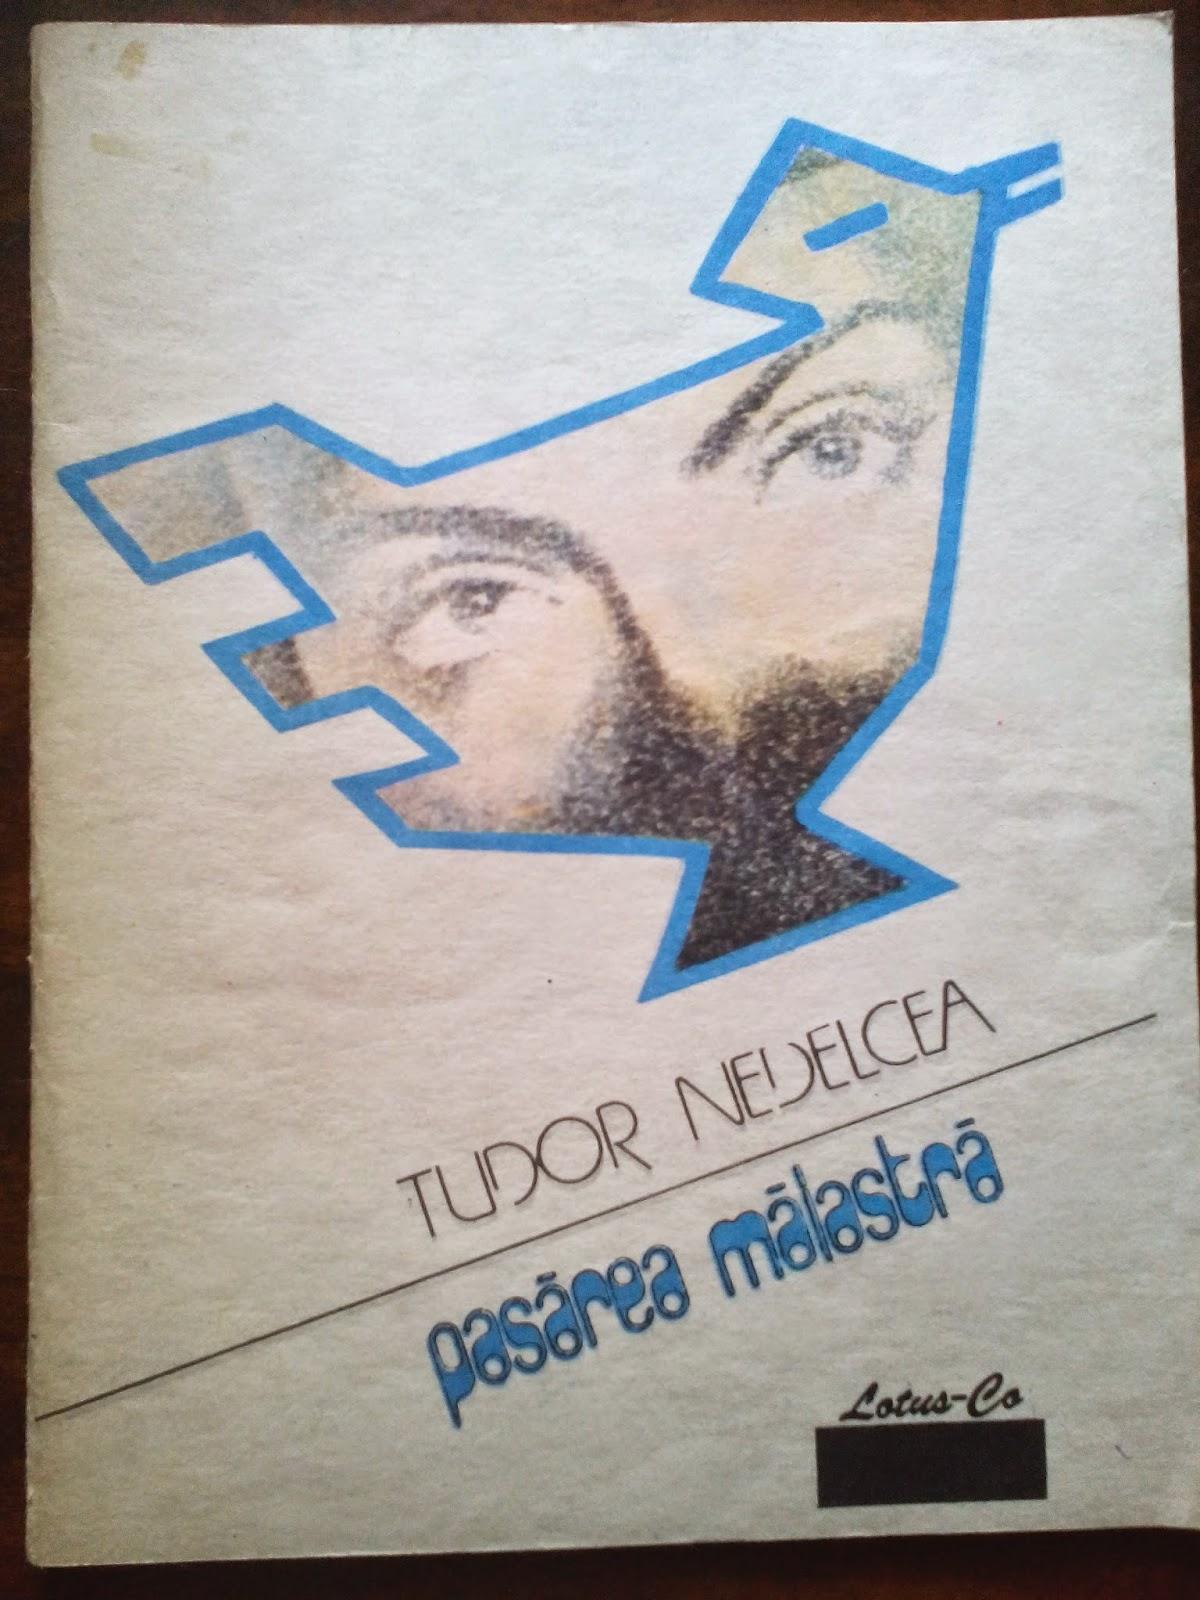 Tudor Nedelcea - Pasarea maiastra